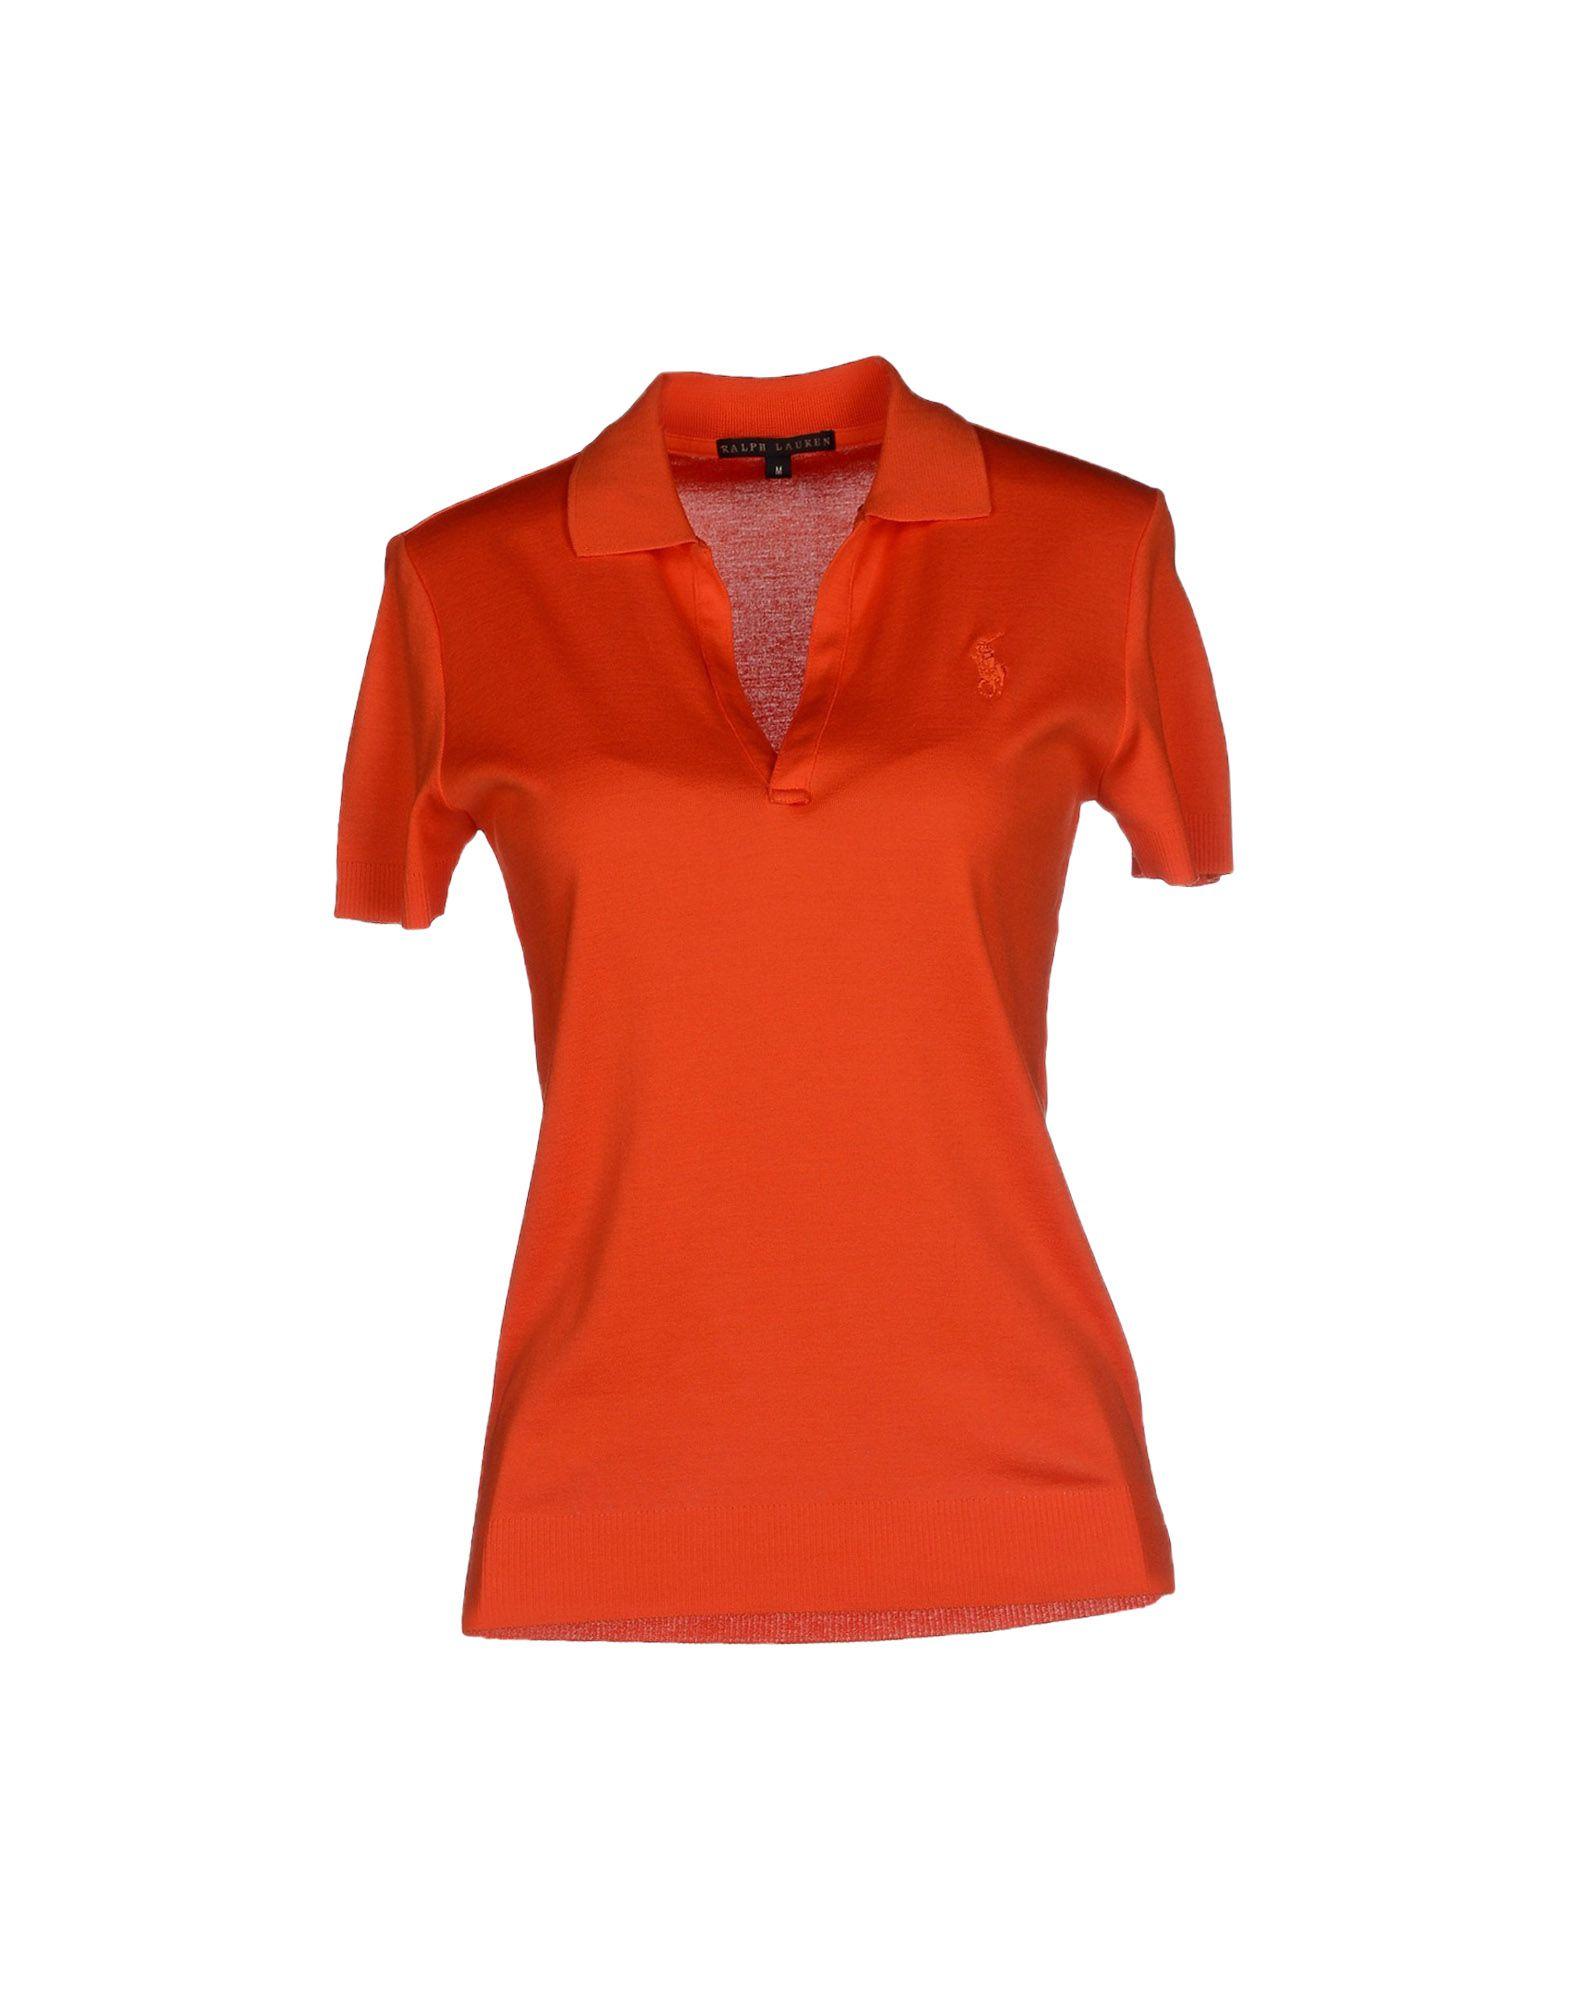 Ralph lauren black label polo shirt in orange for Ralph lauren black label polo shirt